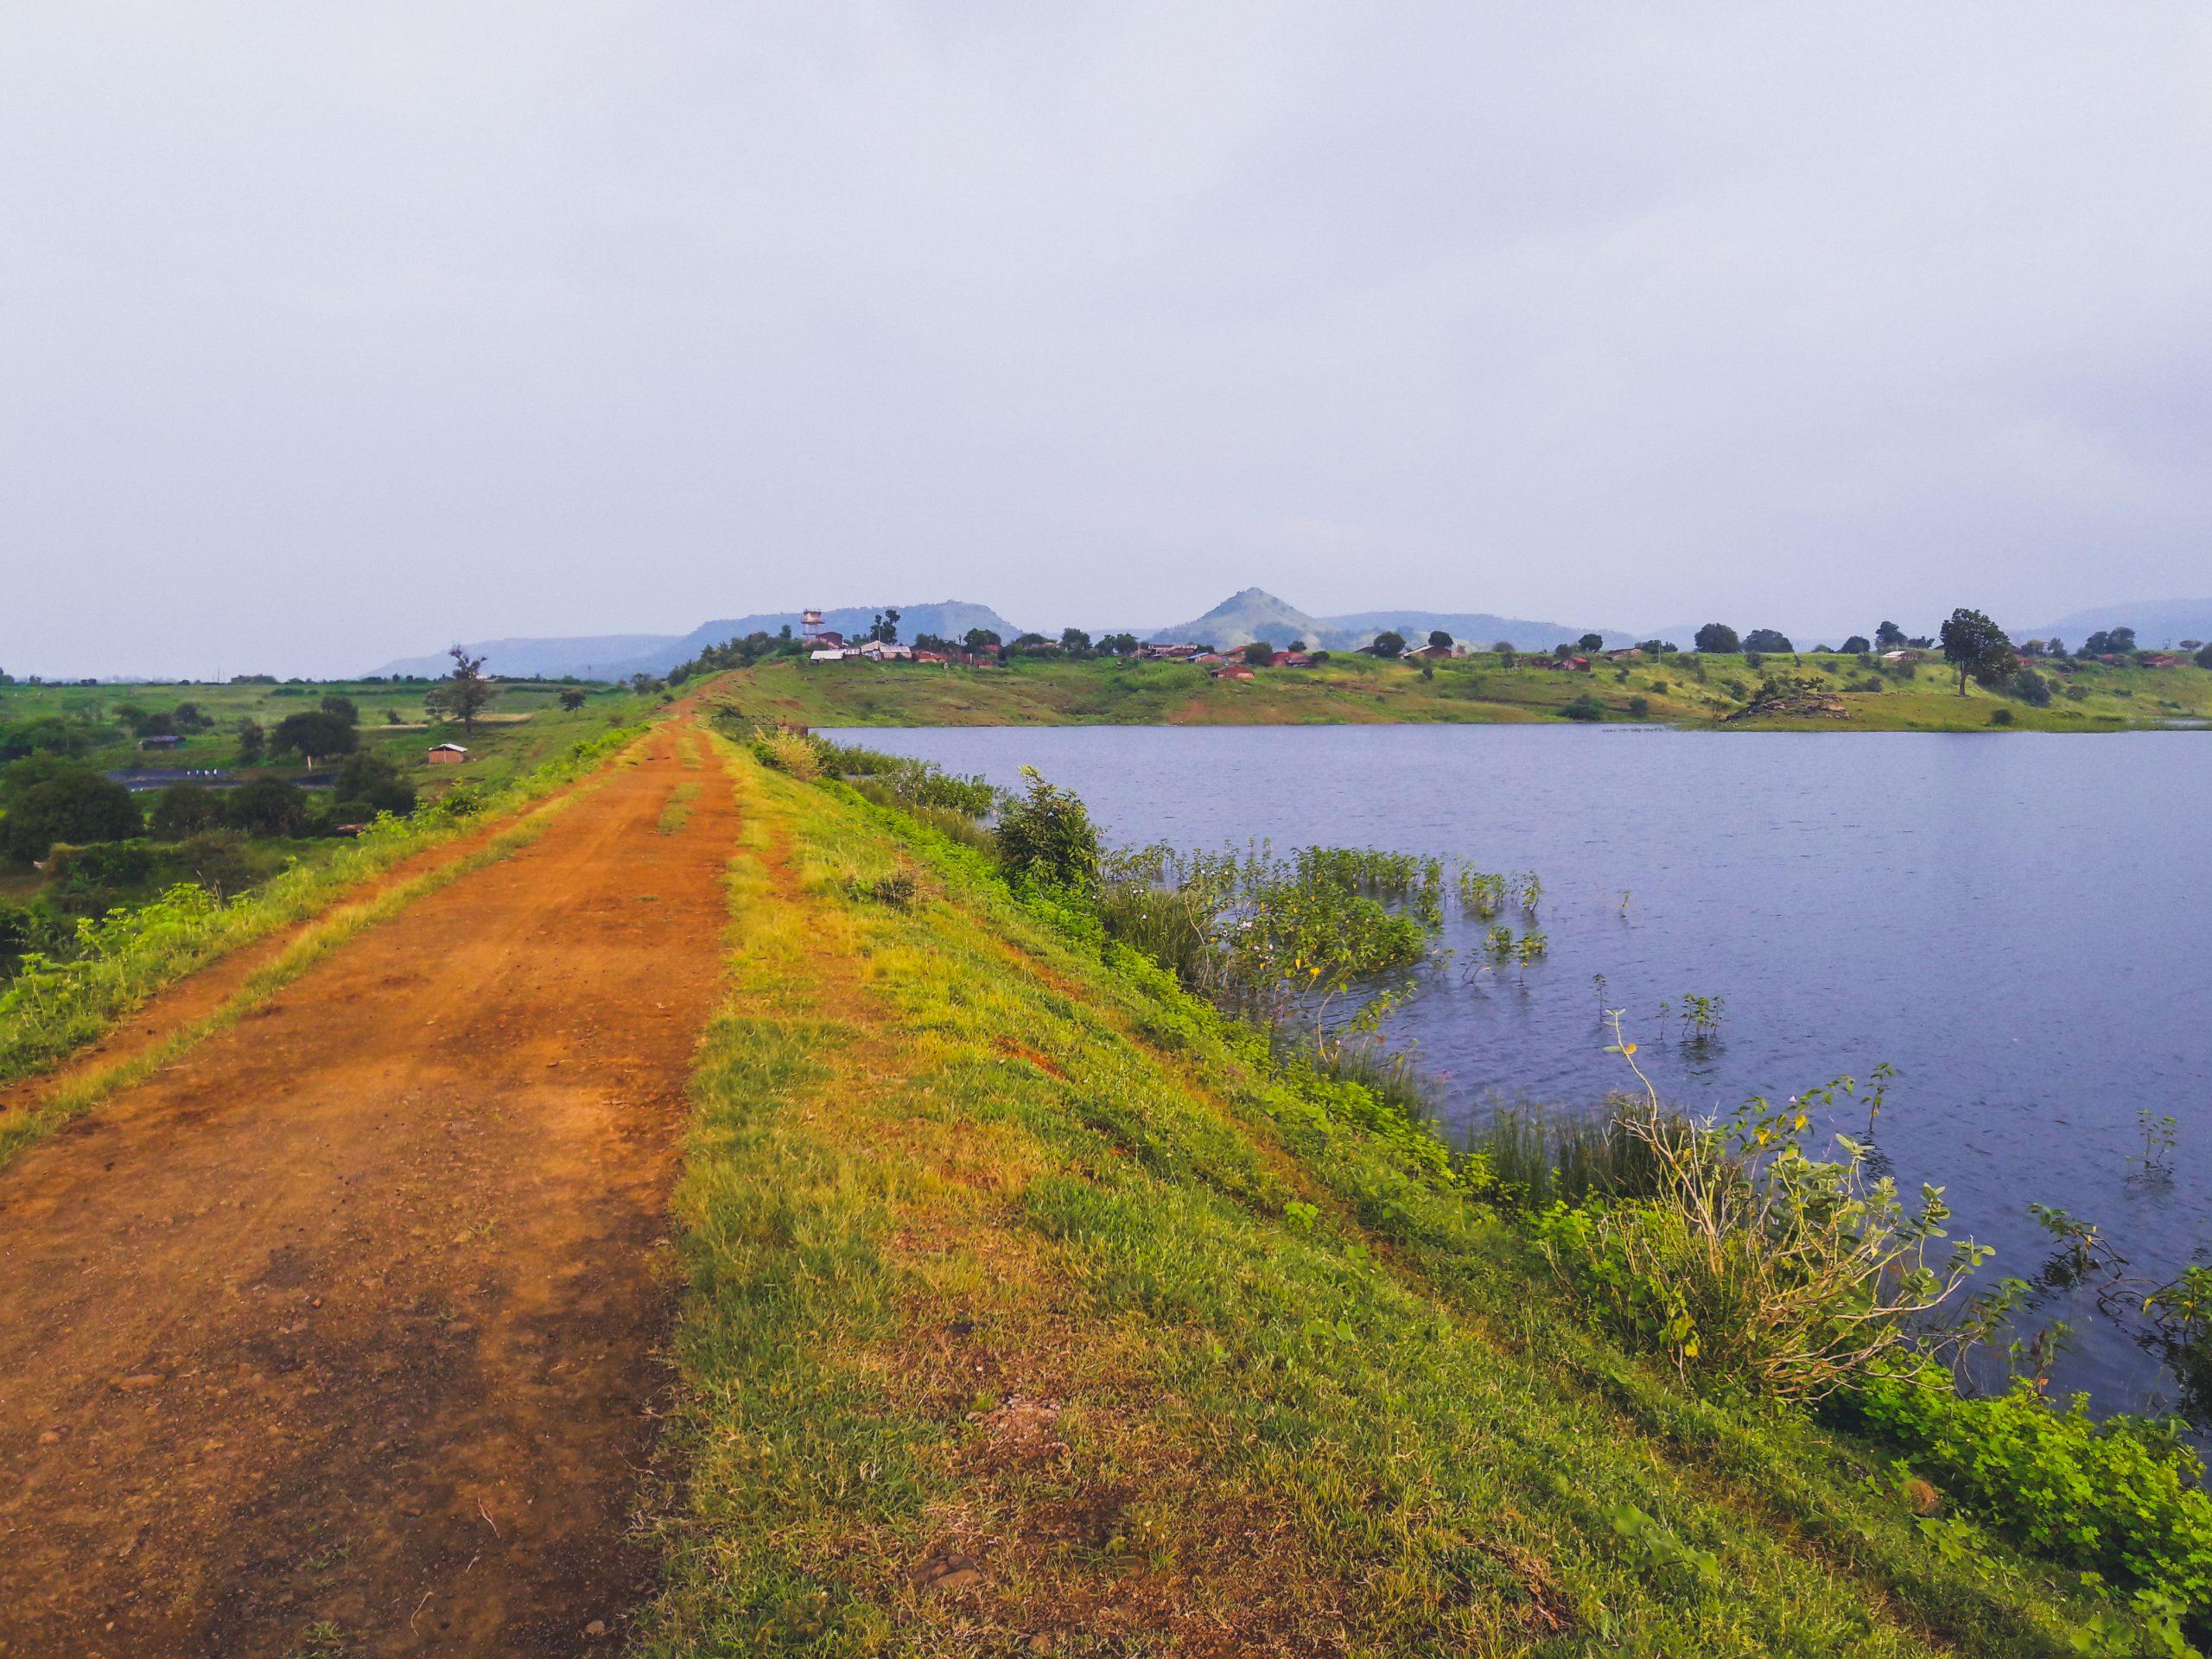 Road near a dam